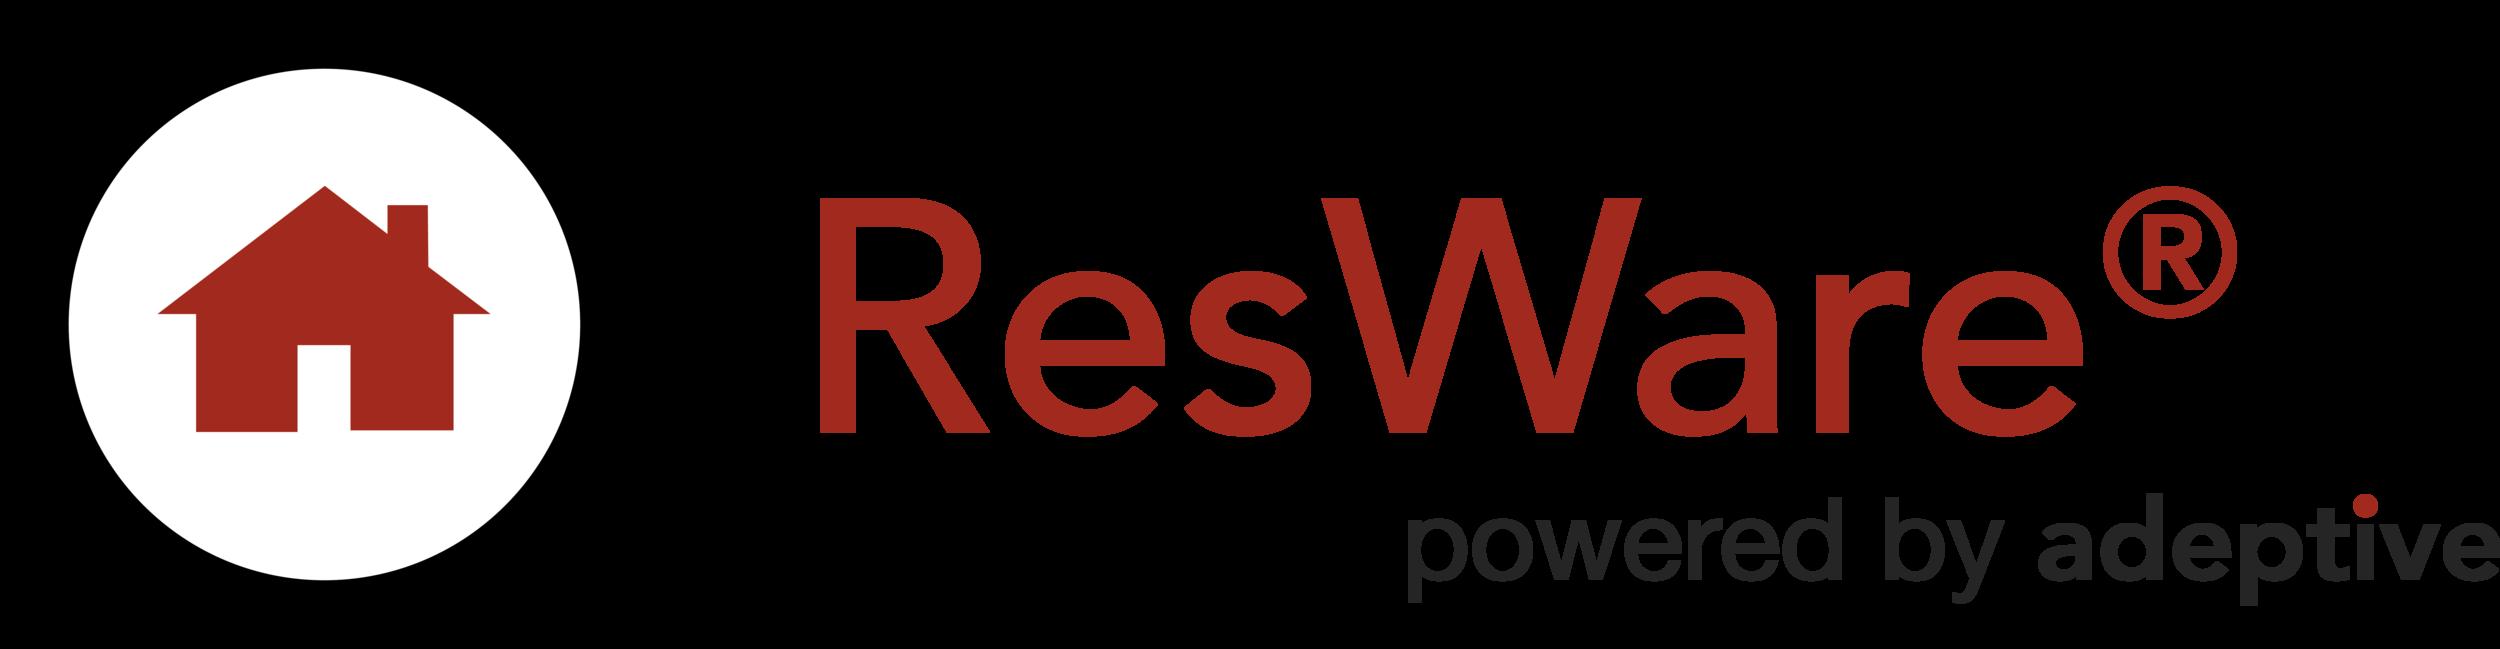 logo_resware.png